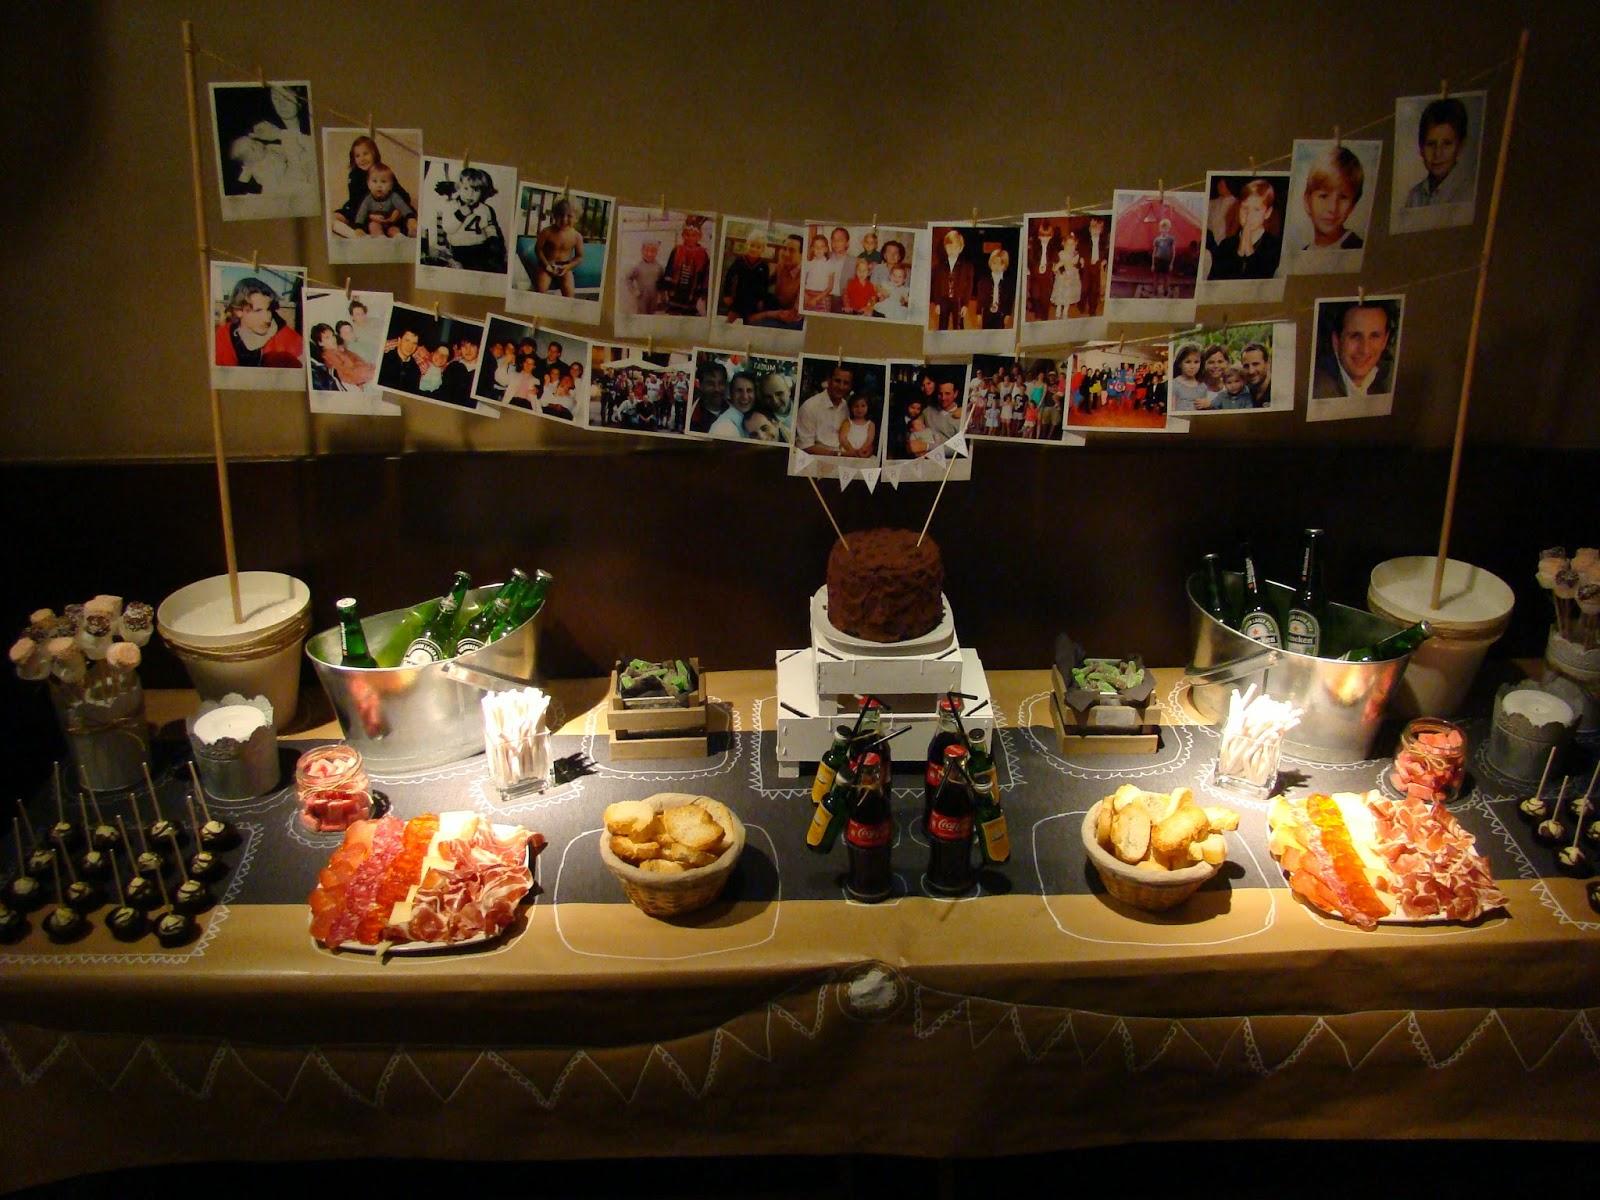 Nuluha design comuni n de marta for Ideas para una cena de picoteo